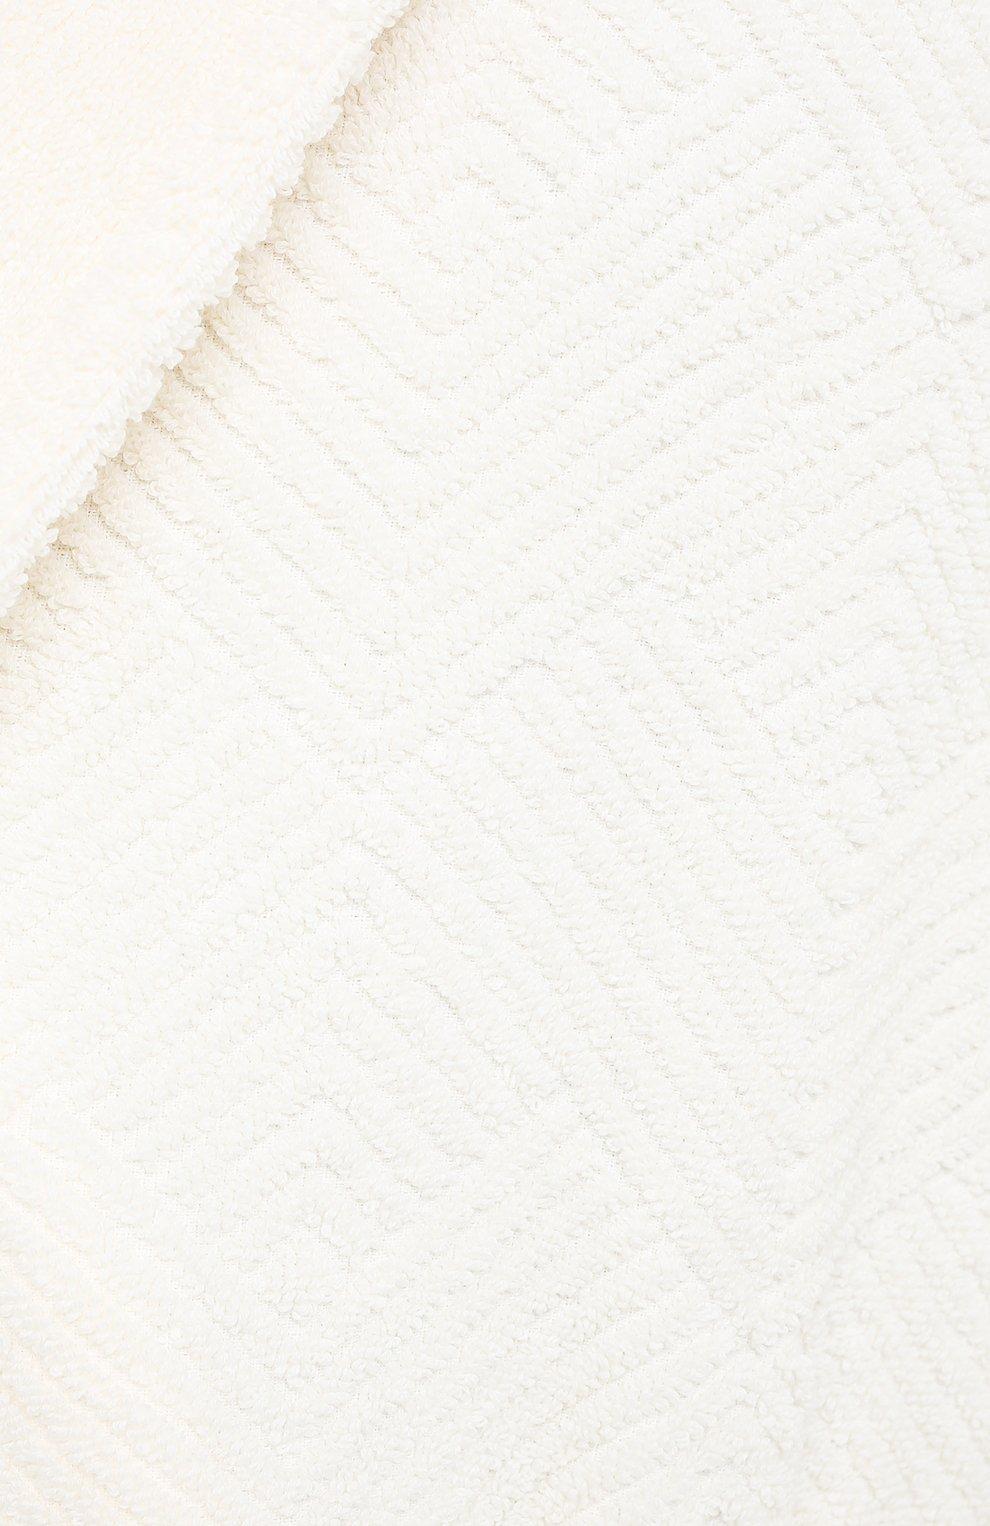 Мужской хлопковый халат FRETTE бежевого цвета, арт. FR6243 D2060 G02M   Фото 5